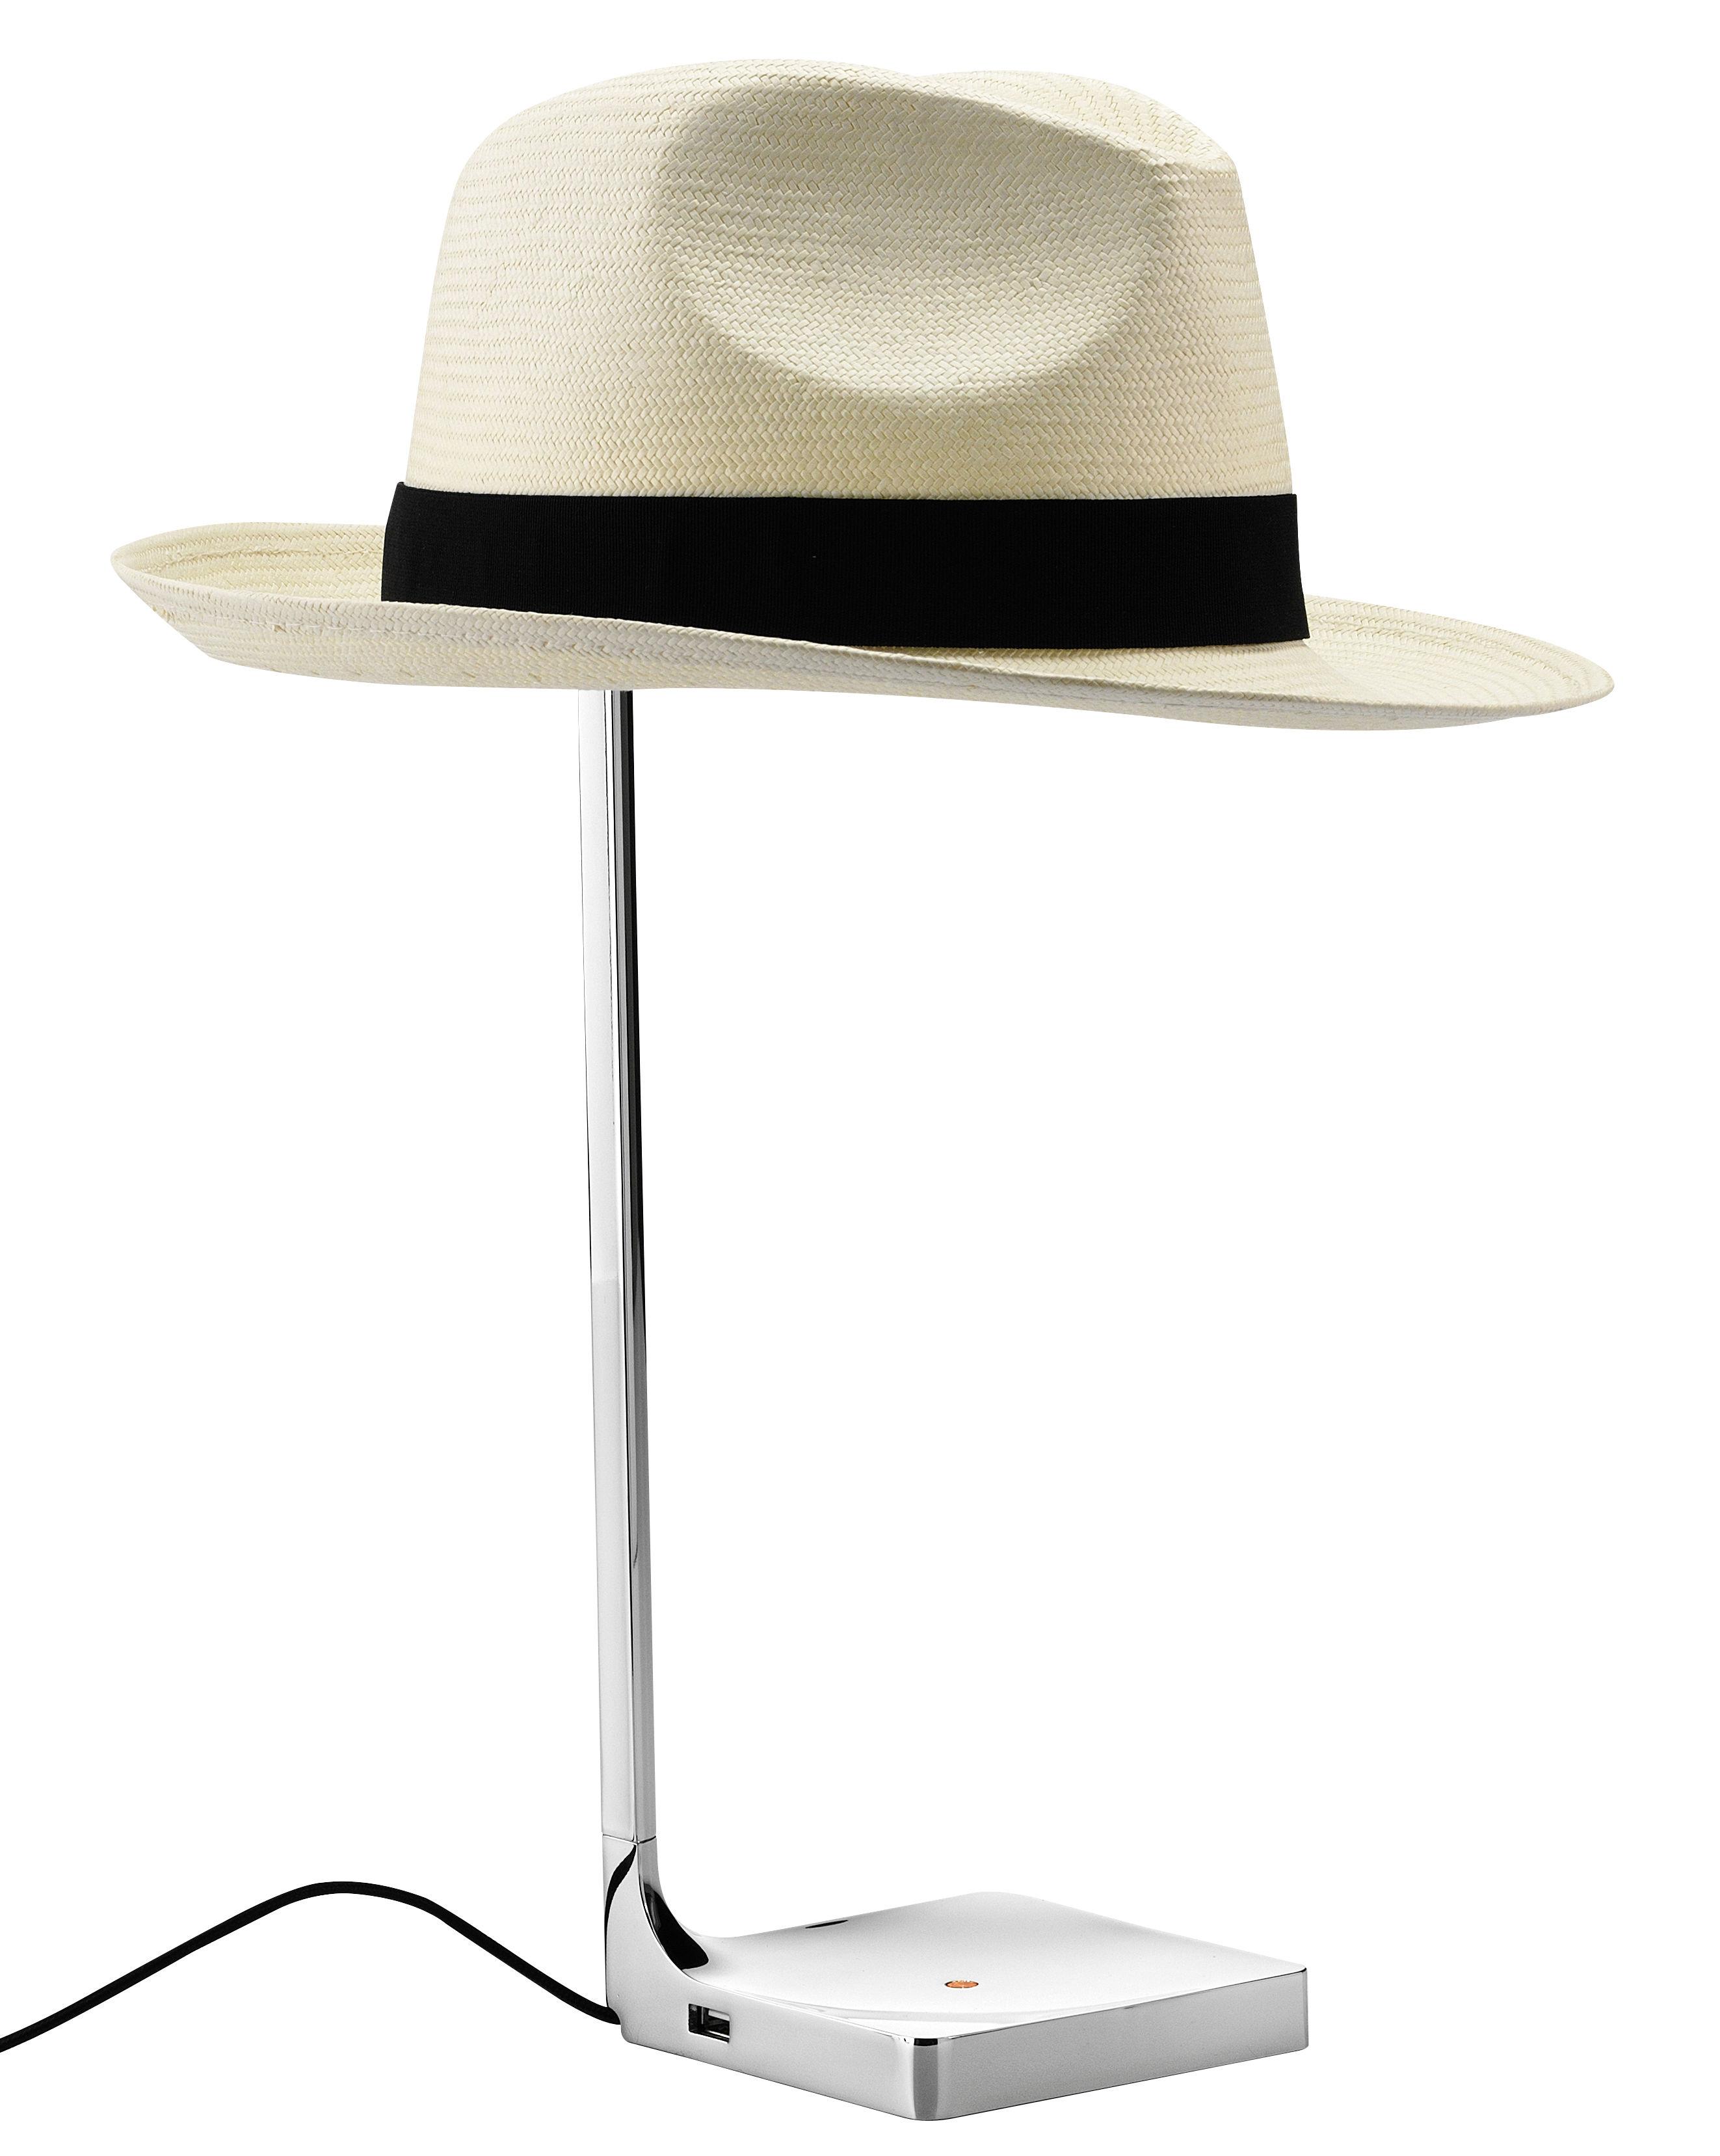 Lighting - Table Lamps - Chapo Table lamp by Flos - Chromed - Chromed aluminium, Straw